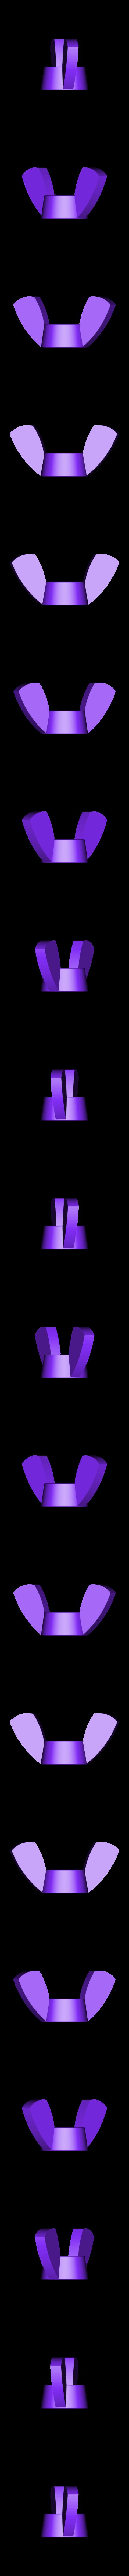 Nut-Butterfly-M4.STL Download free STL file SMD Soldering Clamp • 3D print model, perinski